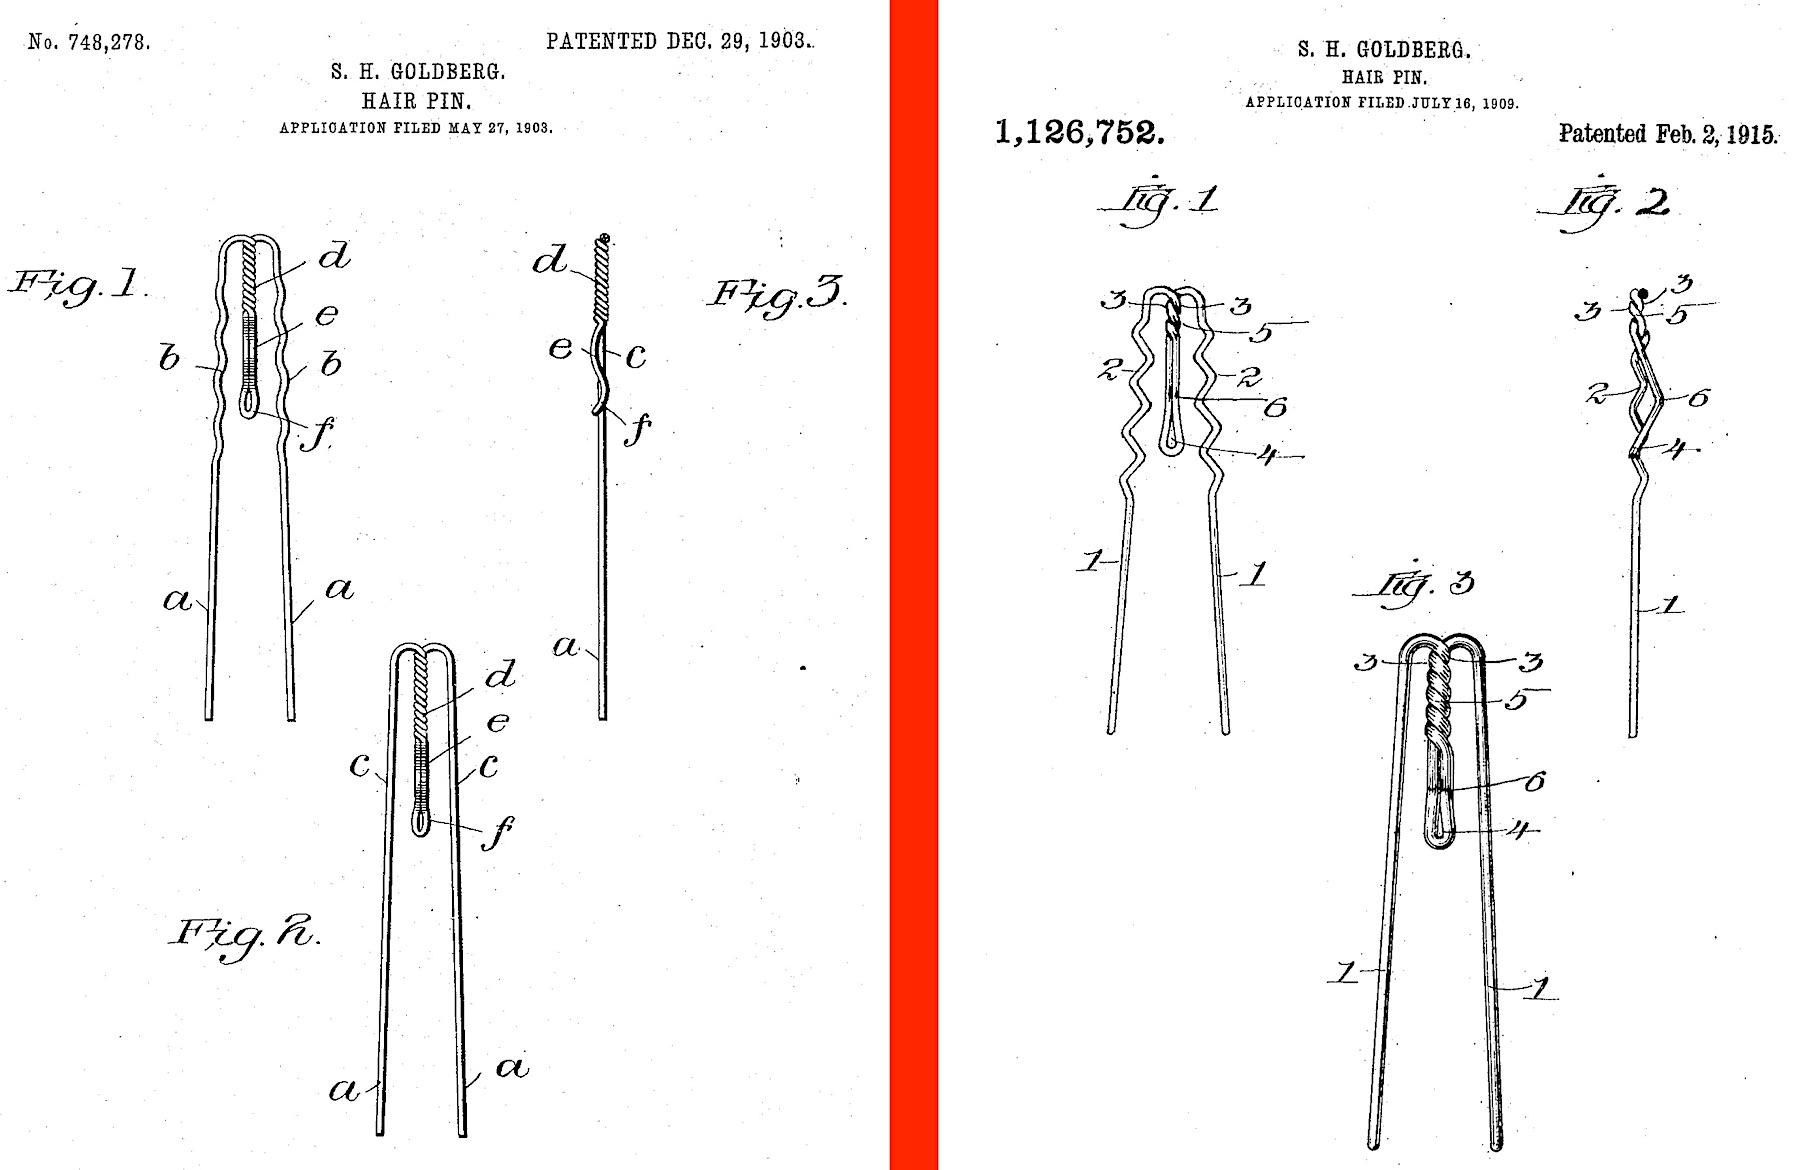 Hump Hairpin patent